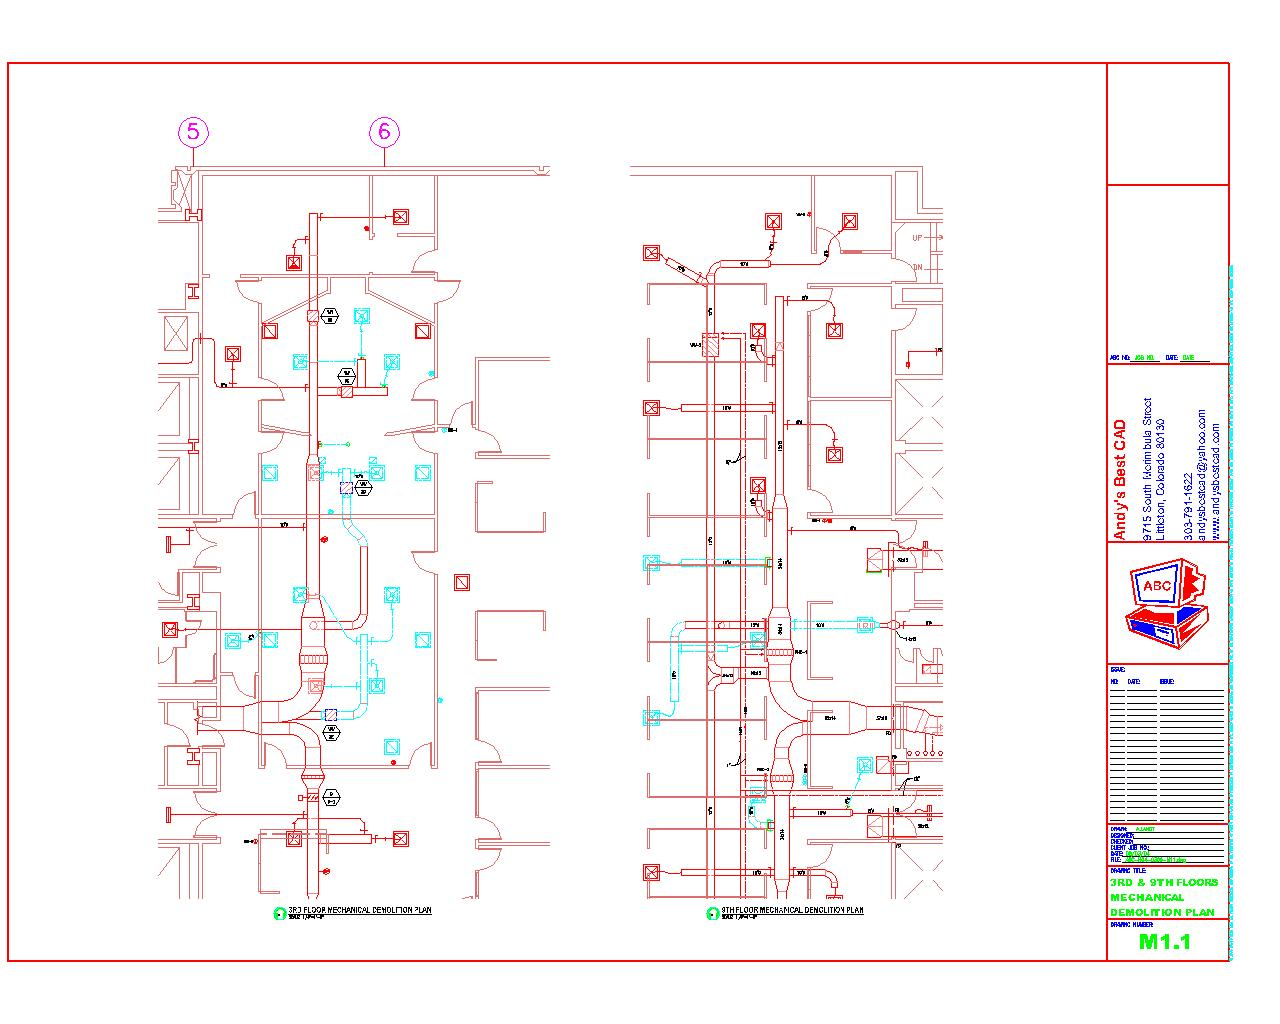 1280x1024 Autocad Hvac Drafting Samples